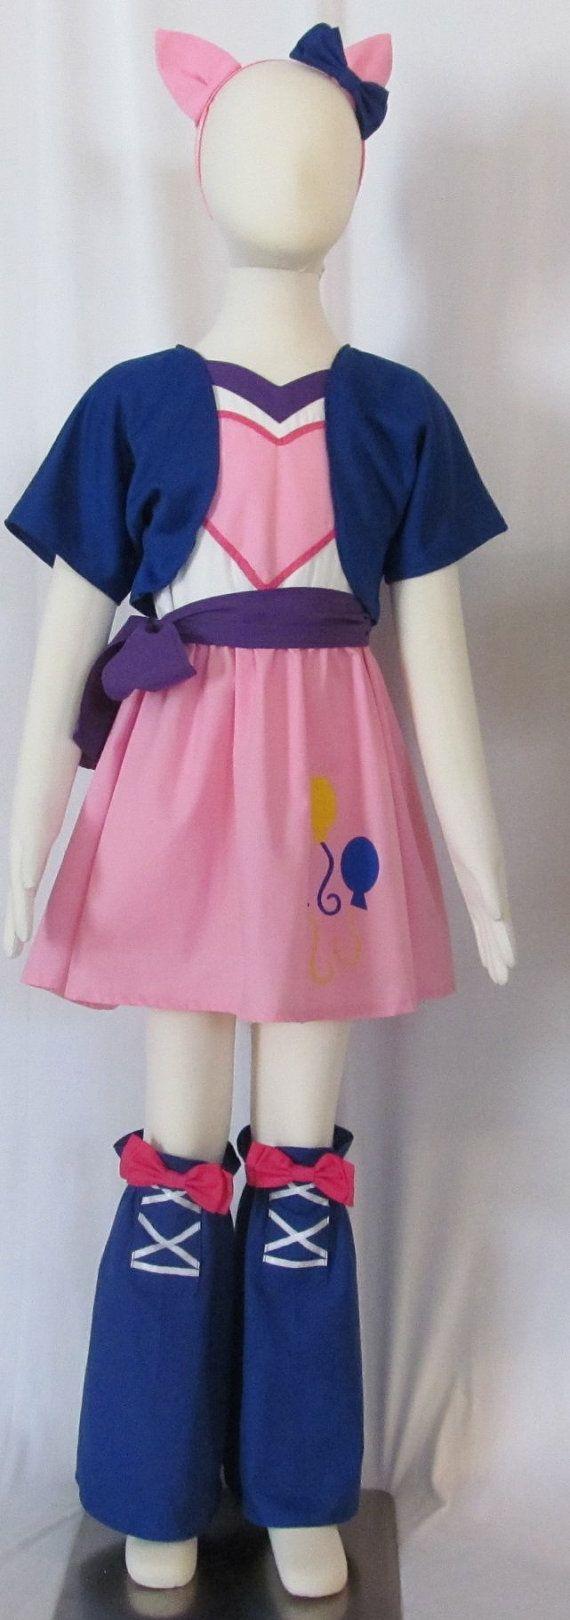 Child Size Pinkie Pie Equestria Girls Cosplay Costume